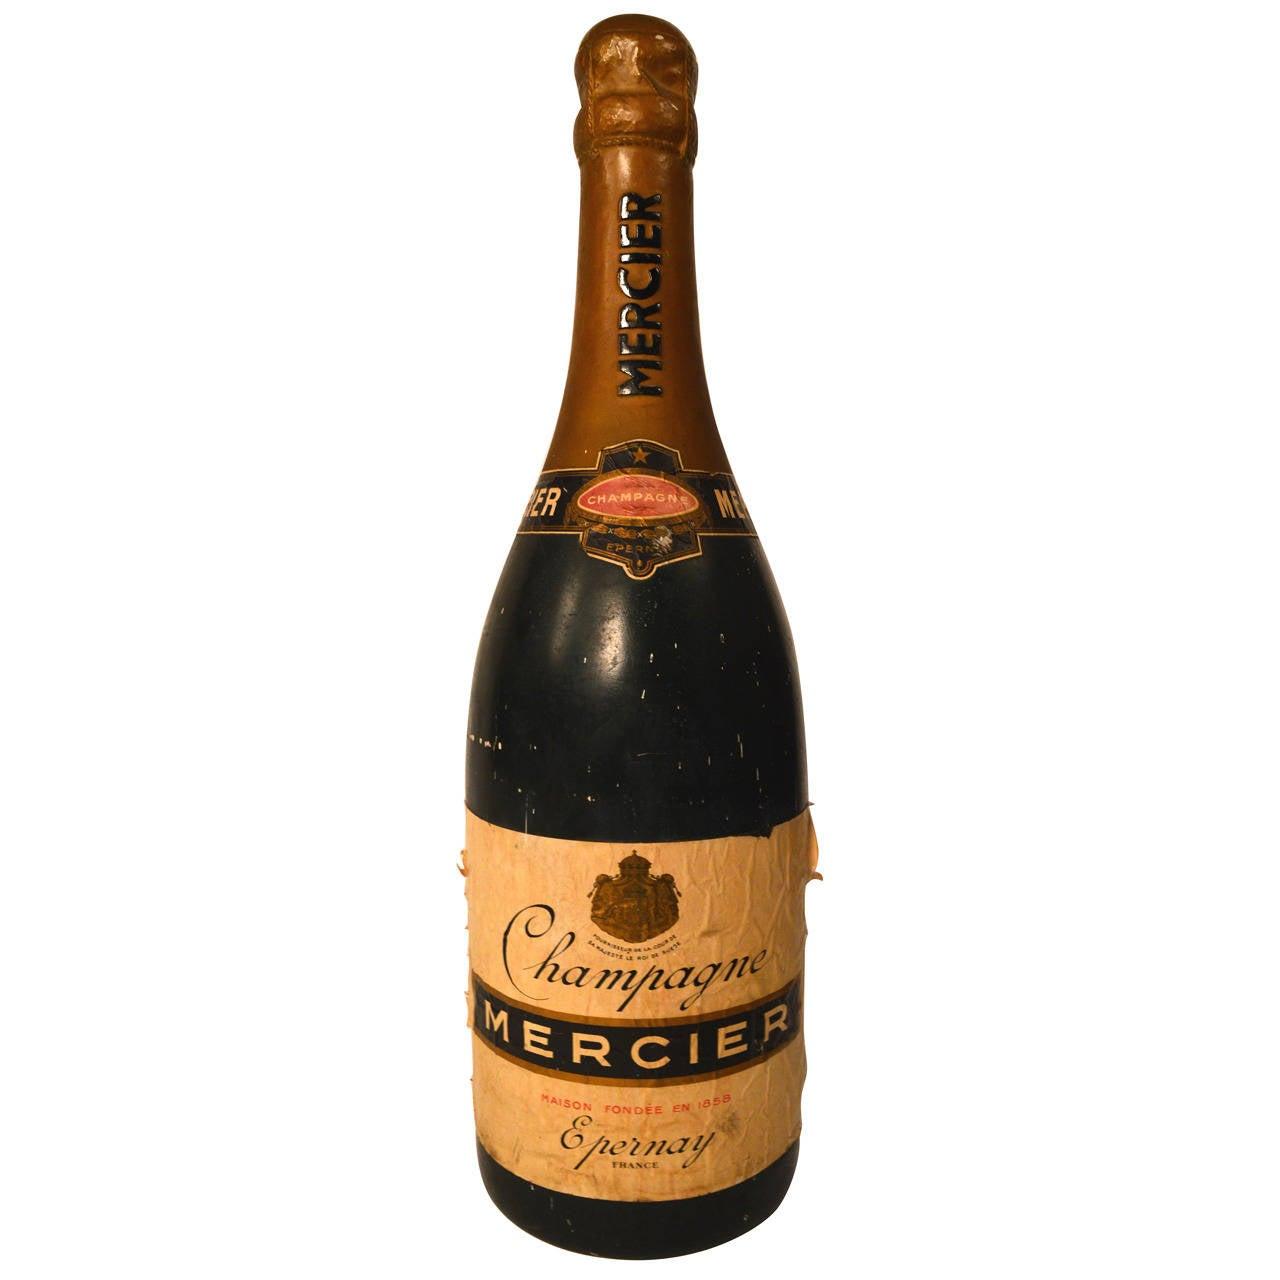 Moderne Large French plaster champagne bottle to advertise Mercier VP-08